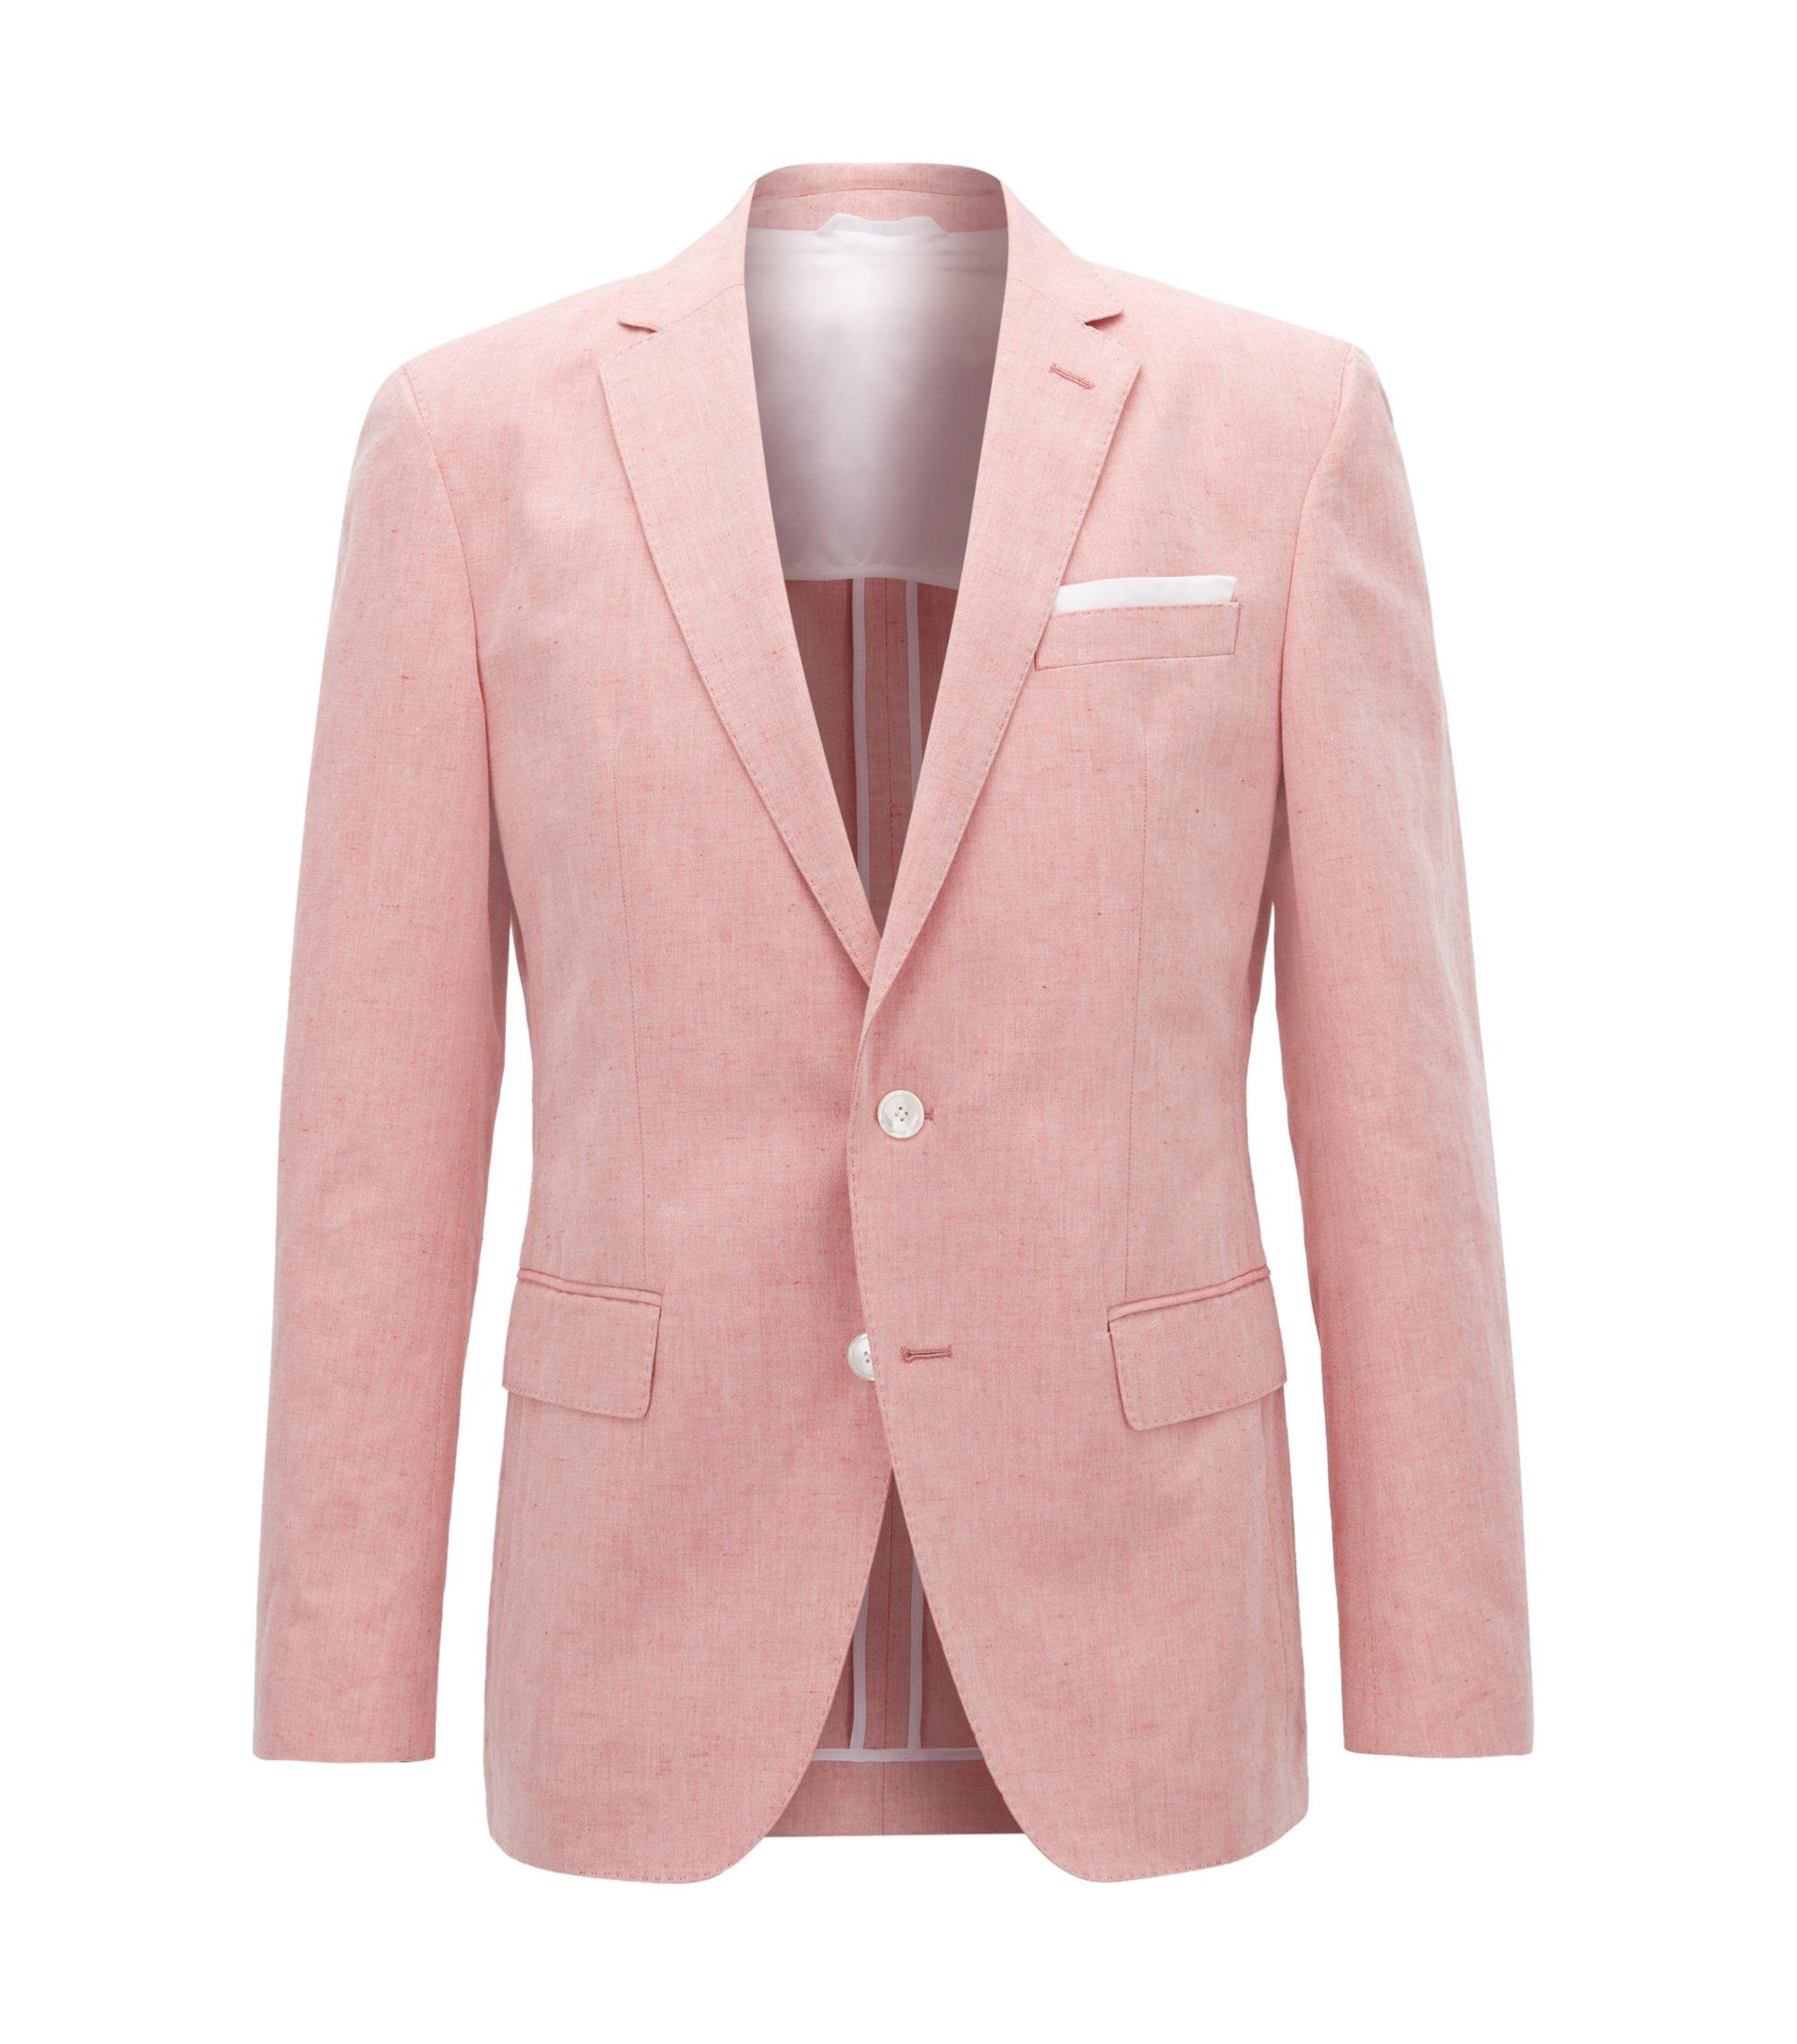 Linen Cotton Sport Coat, Slim Fit | Hartlay, Red